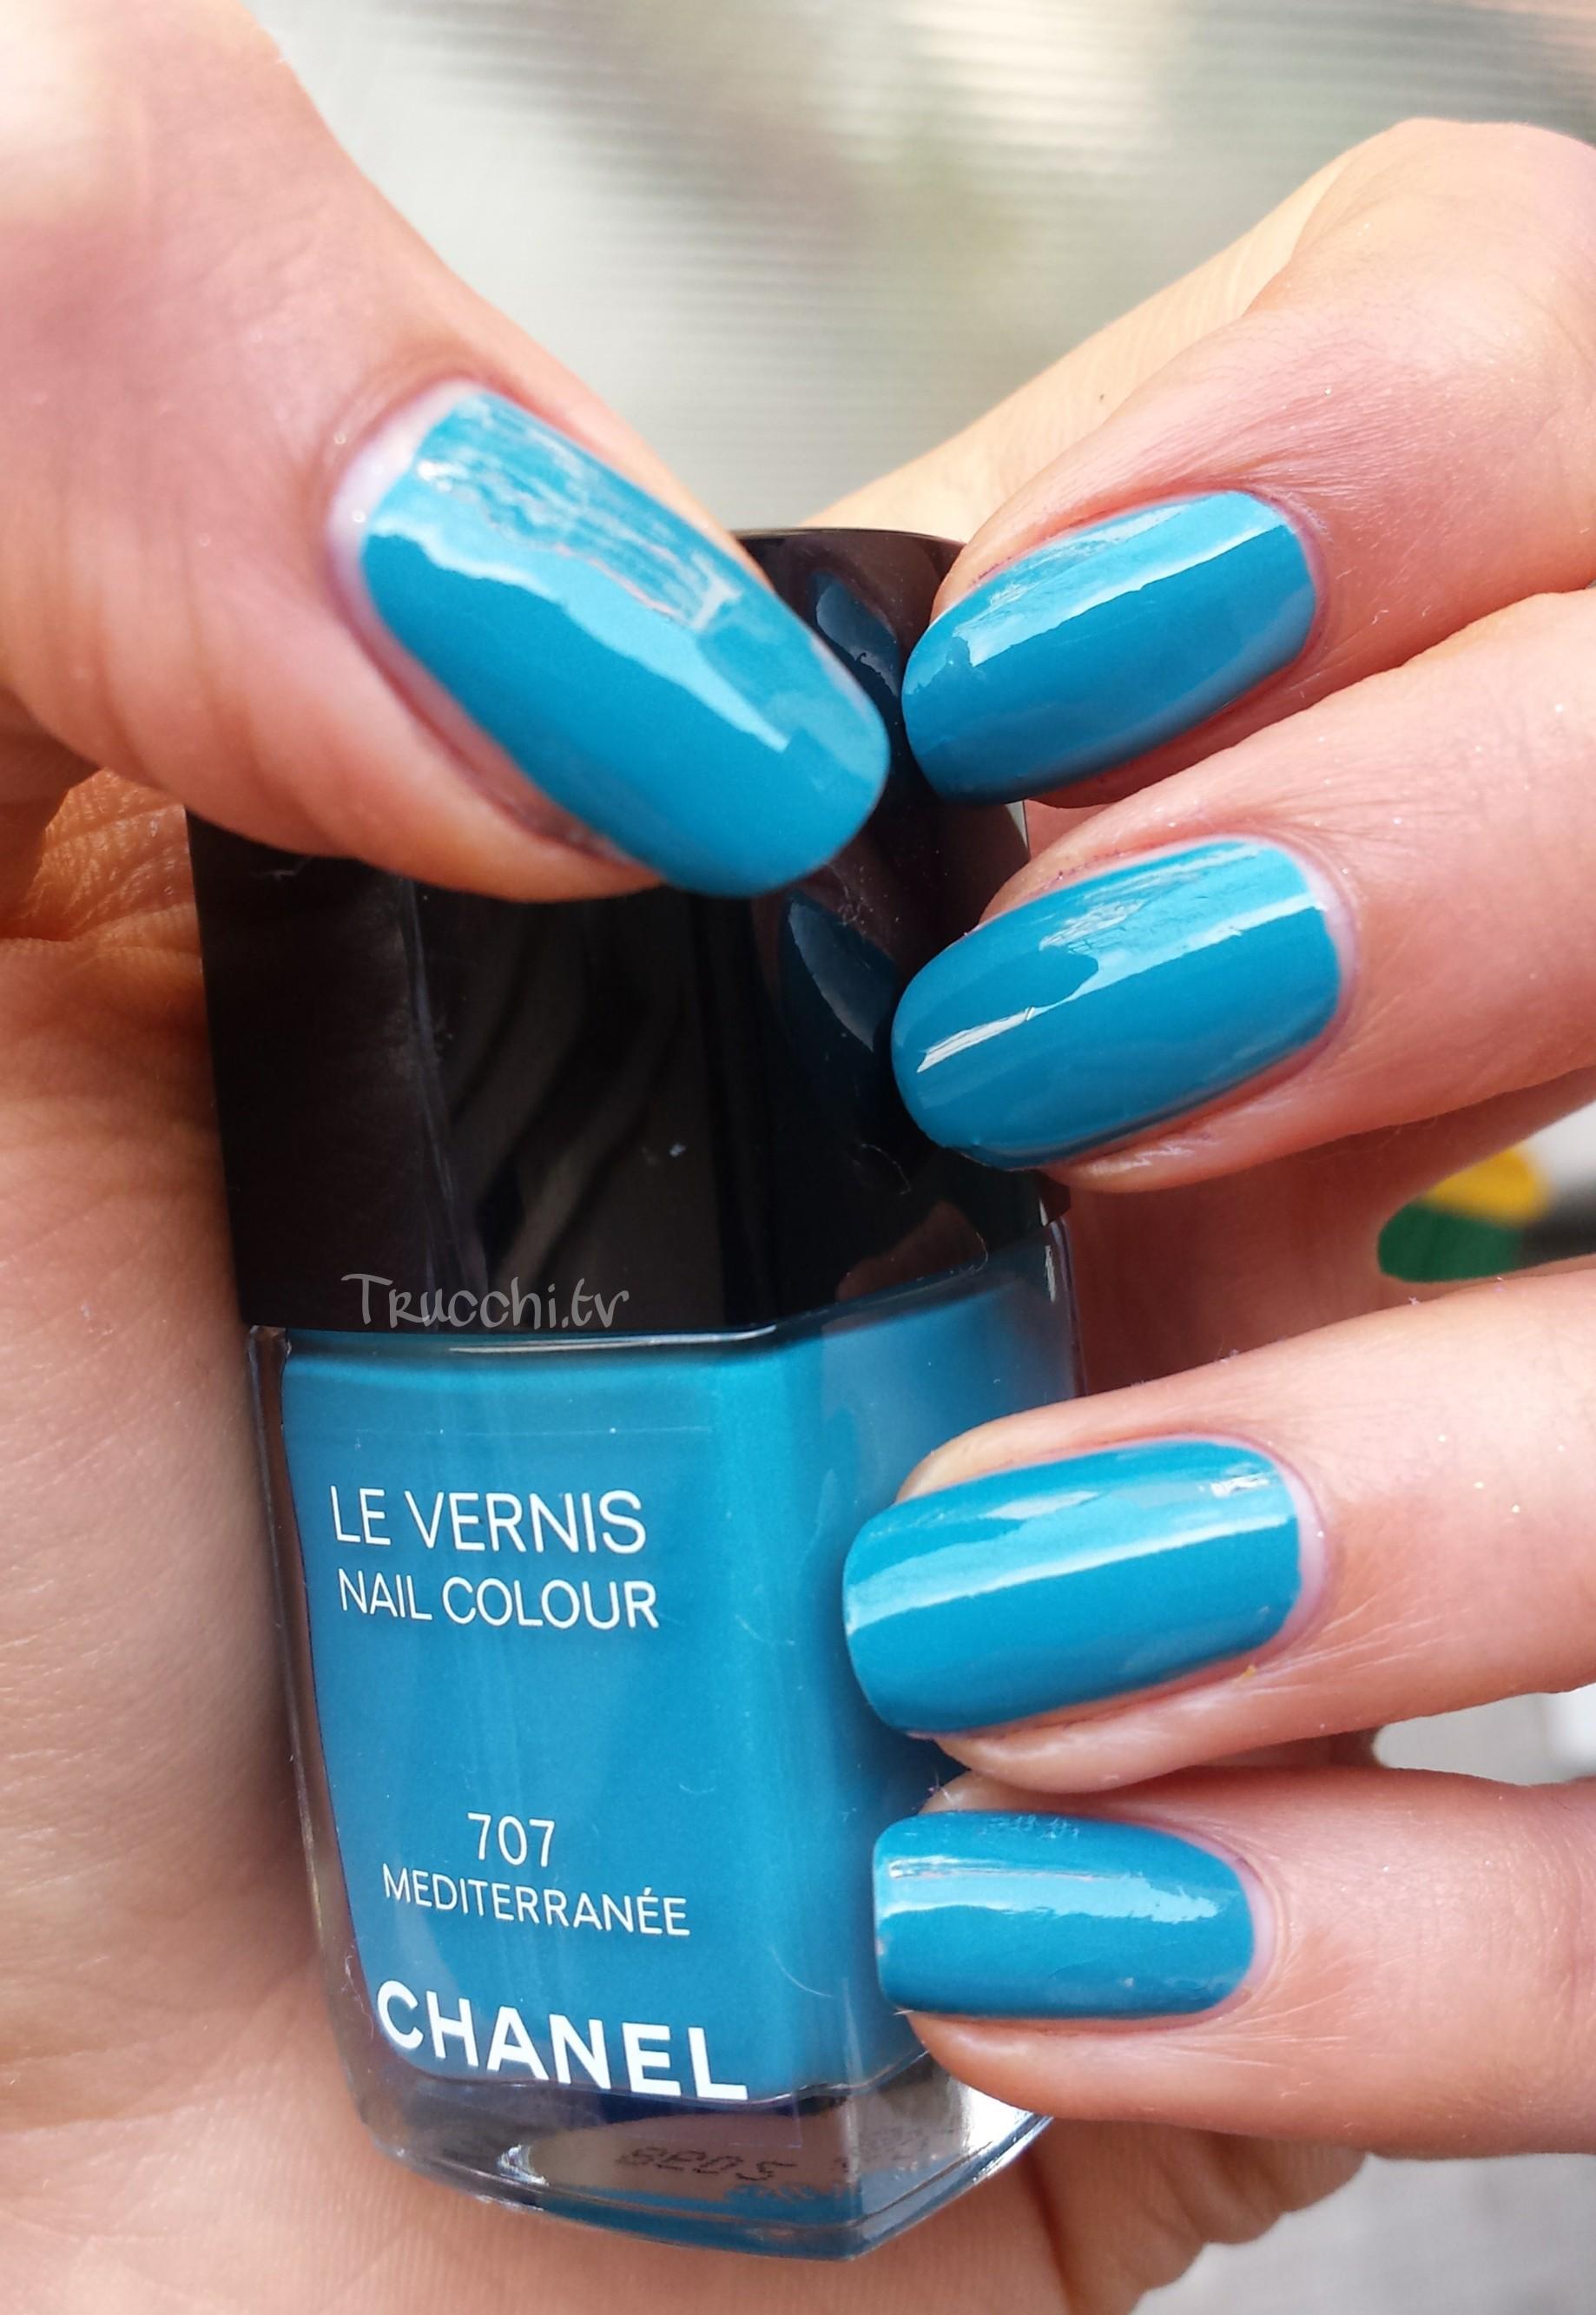 Review le vernis nail colour Chanel 707 Mediterranee